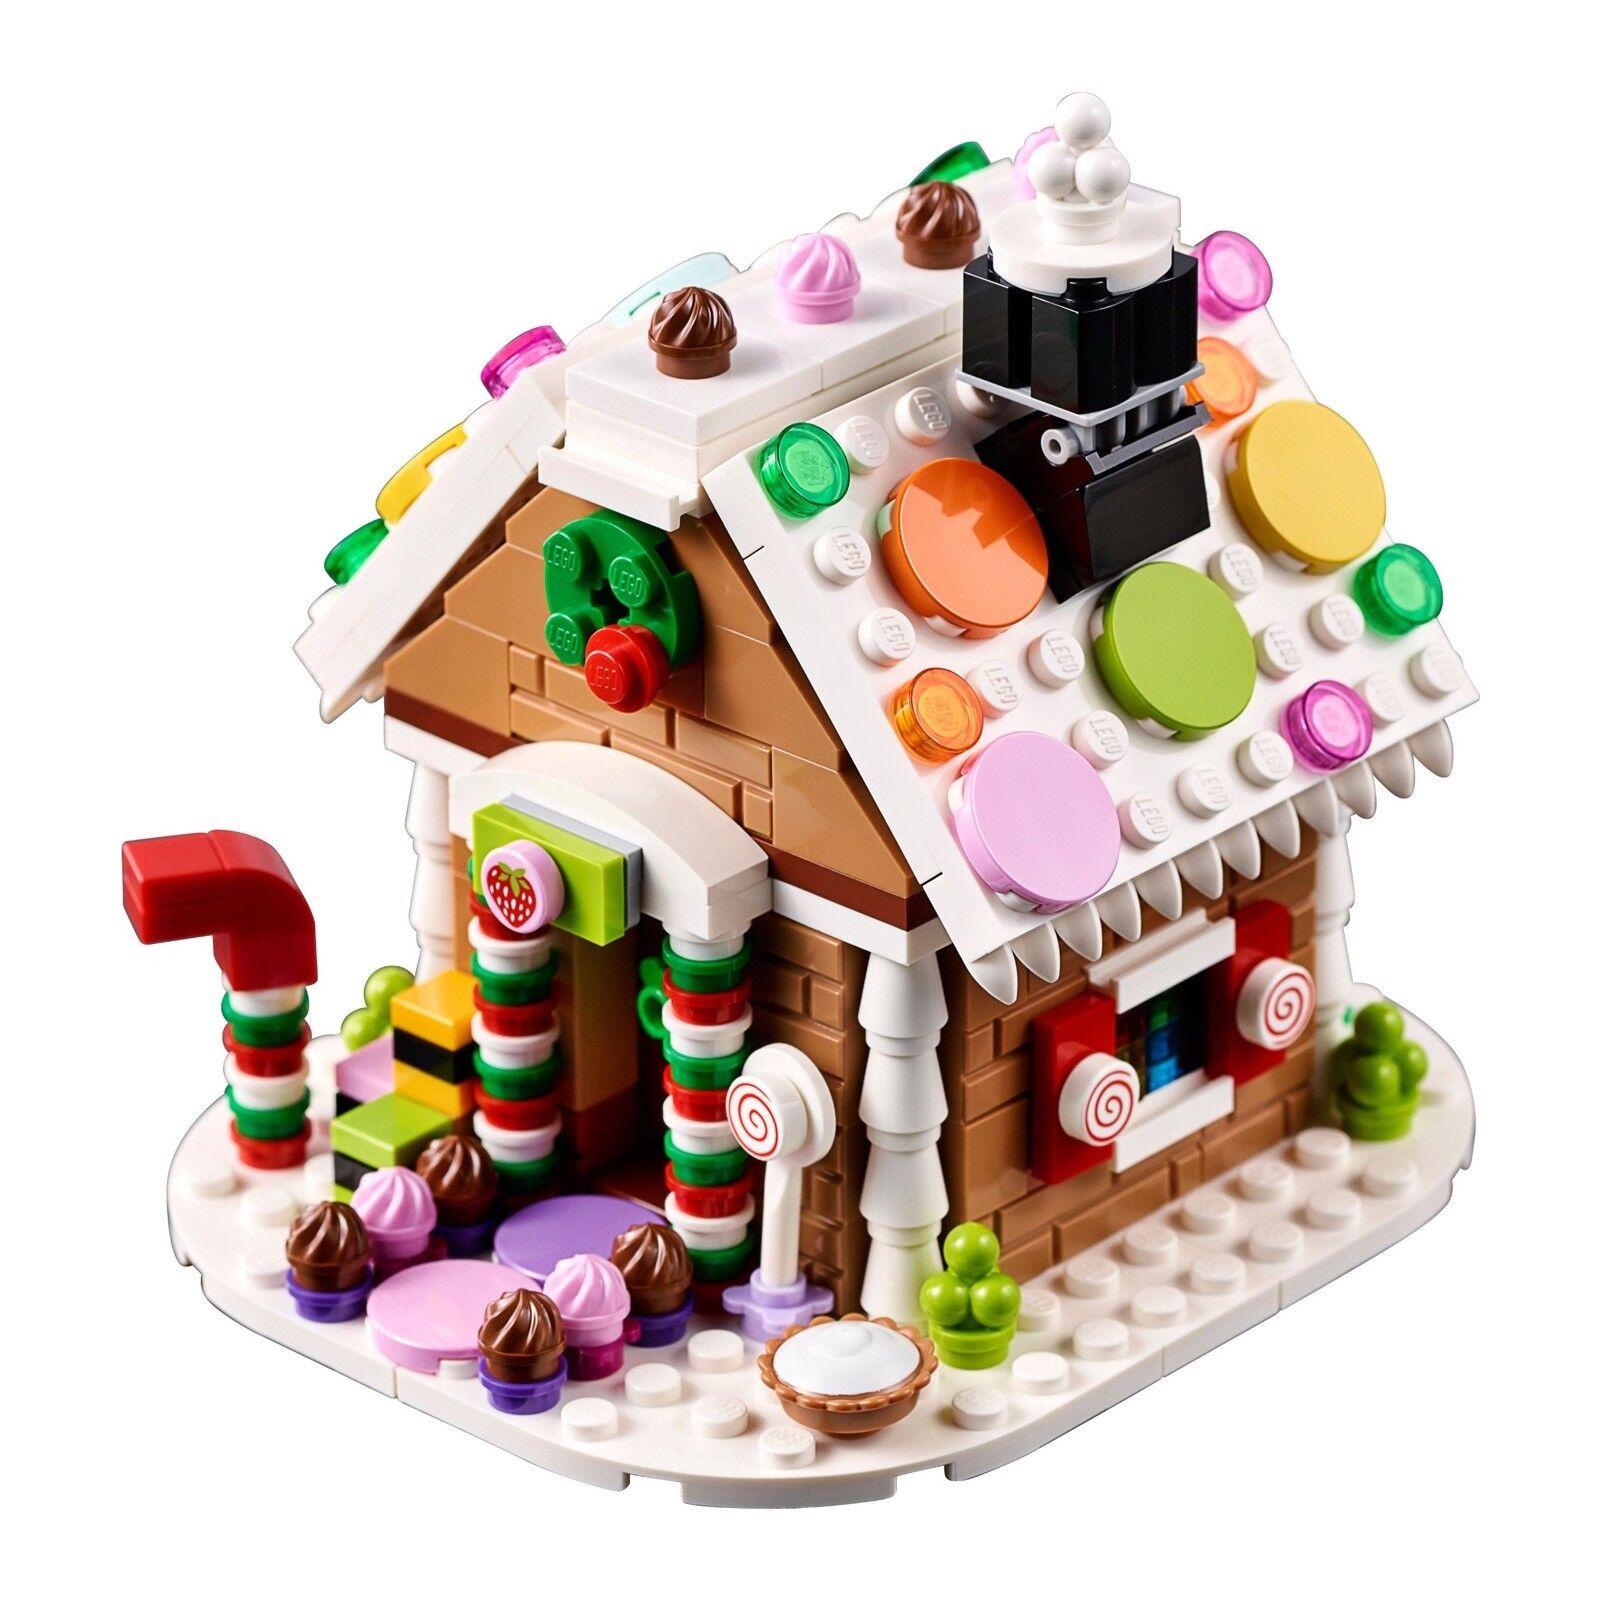 2015 LEGO Exculsive Set - Holiday Gingerbread House Set 40139   - READ   la migliore offerta del negozio online